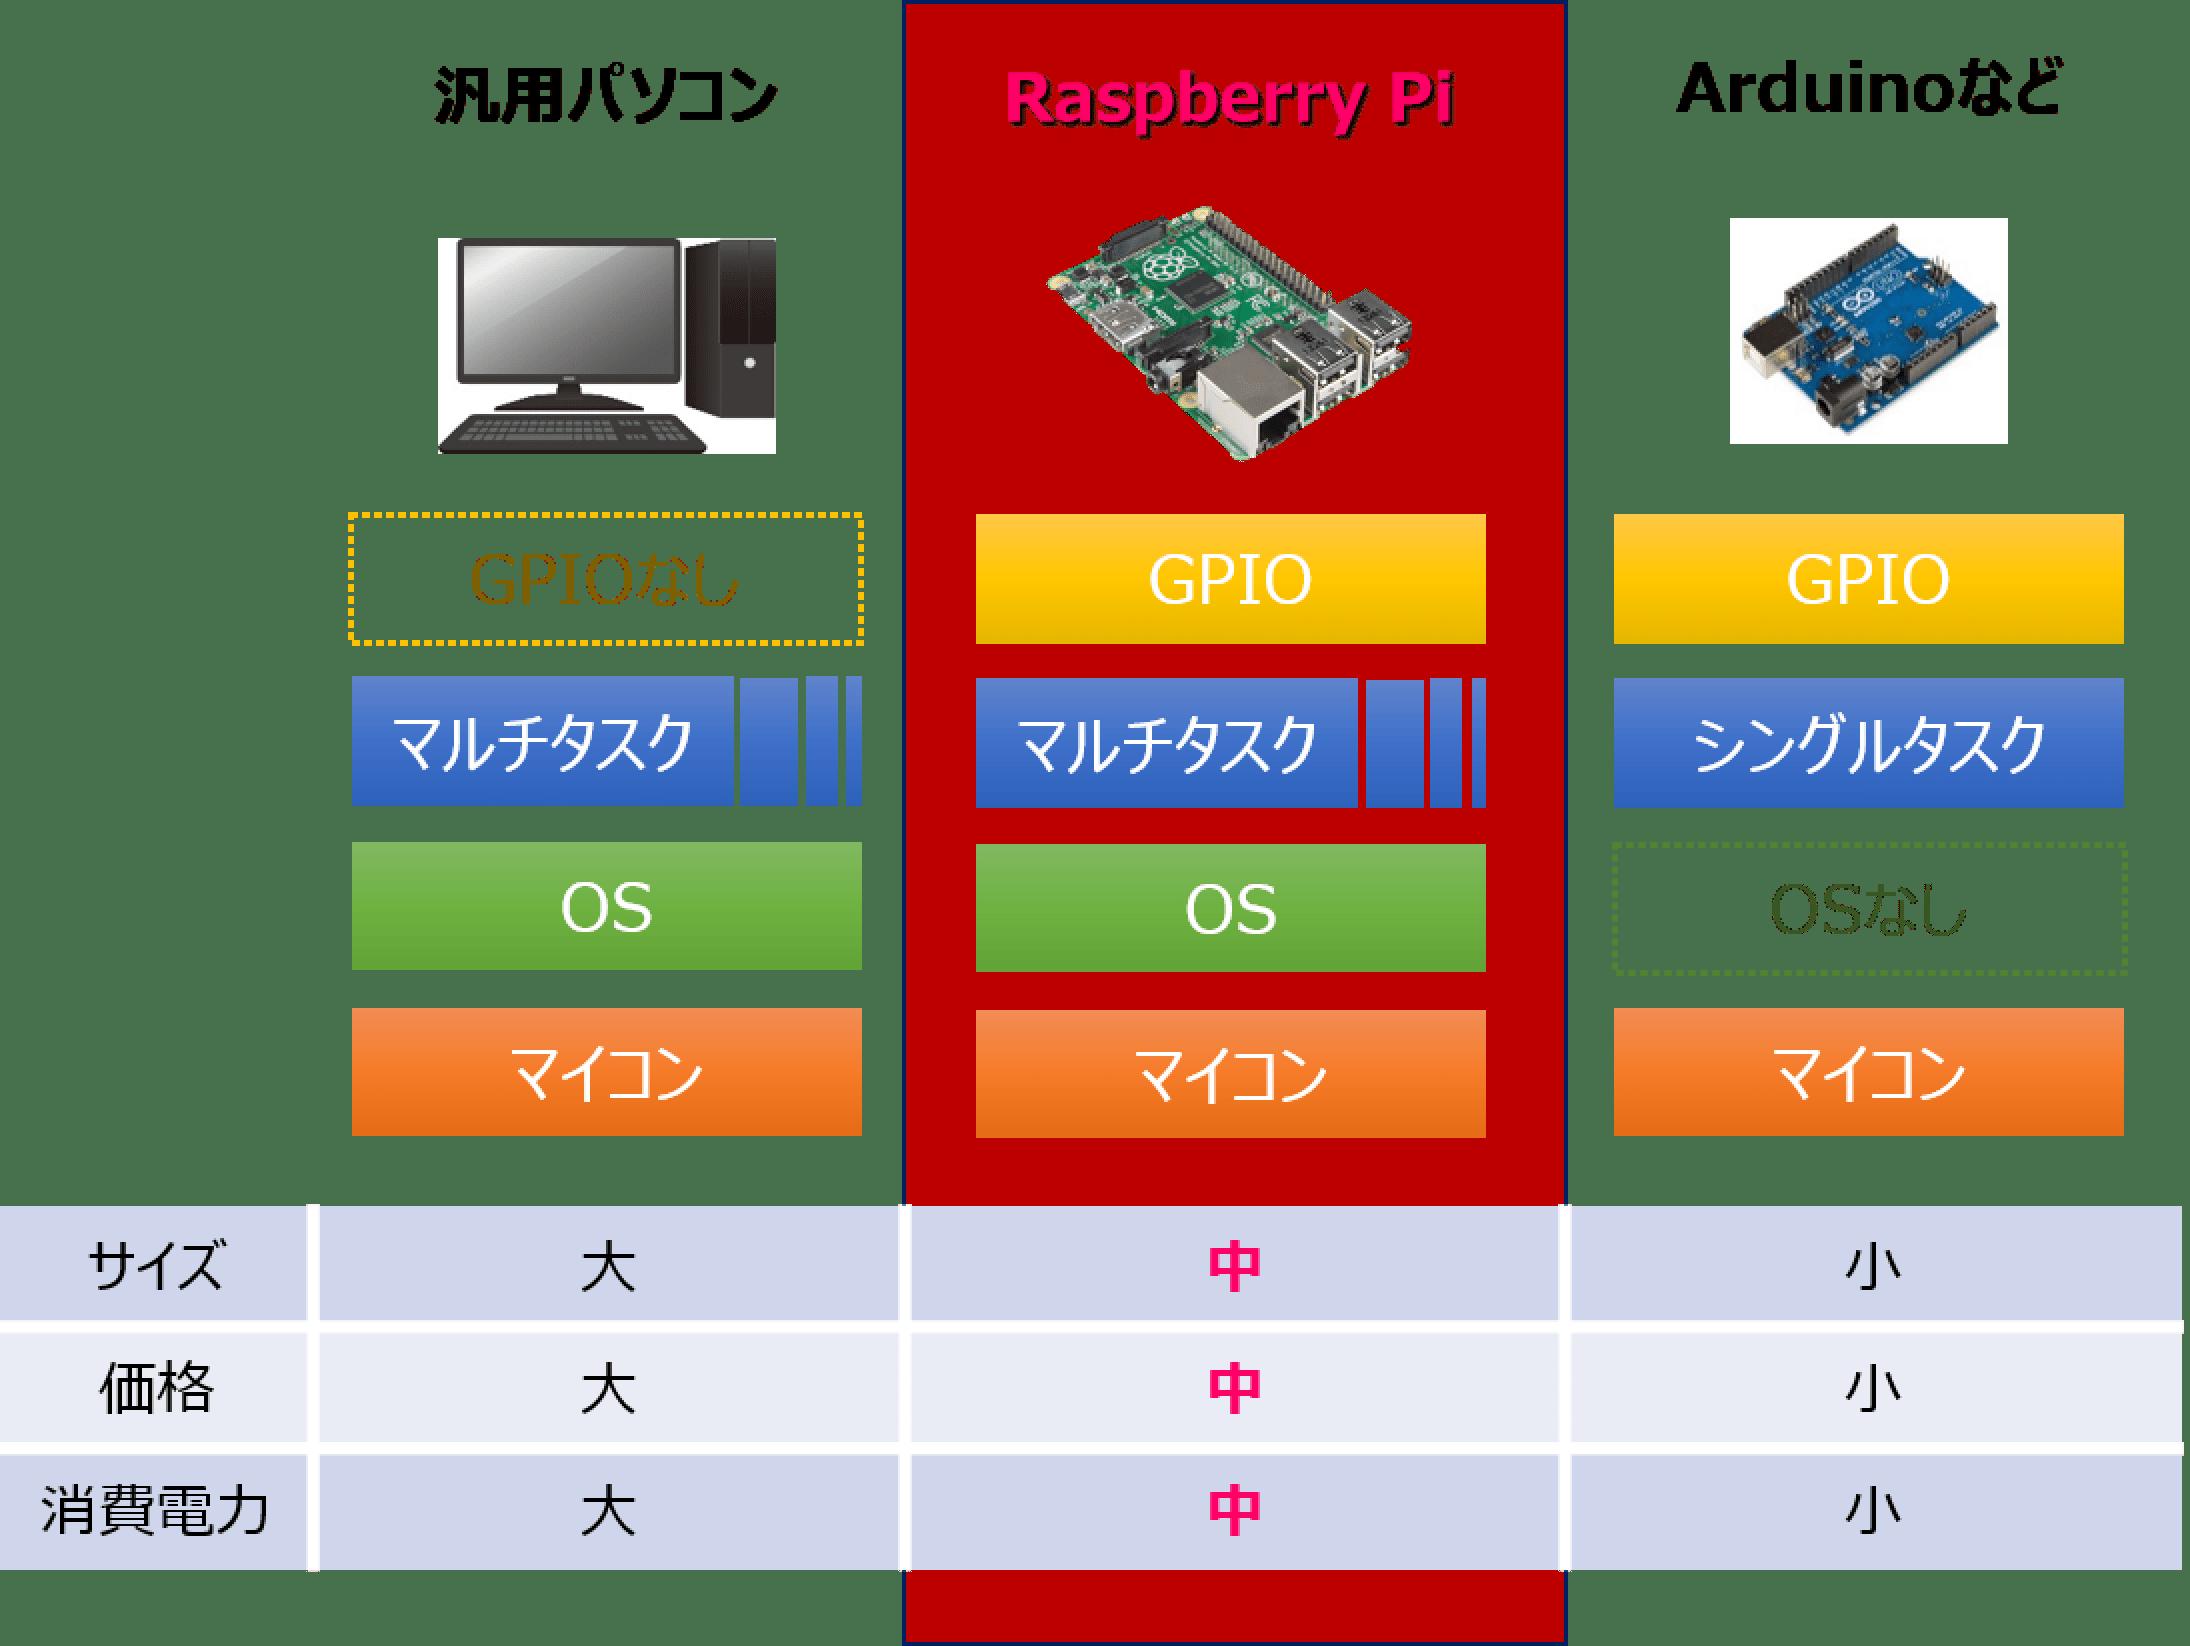 Raspberry Piと他マイコンとの比較